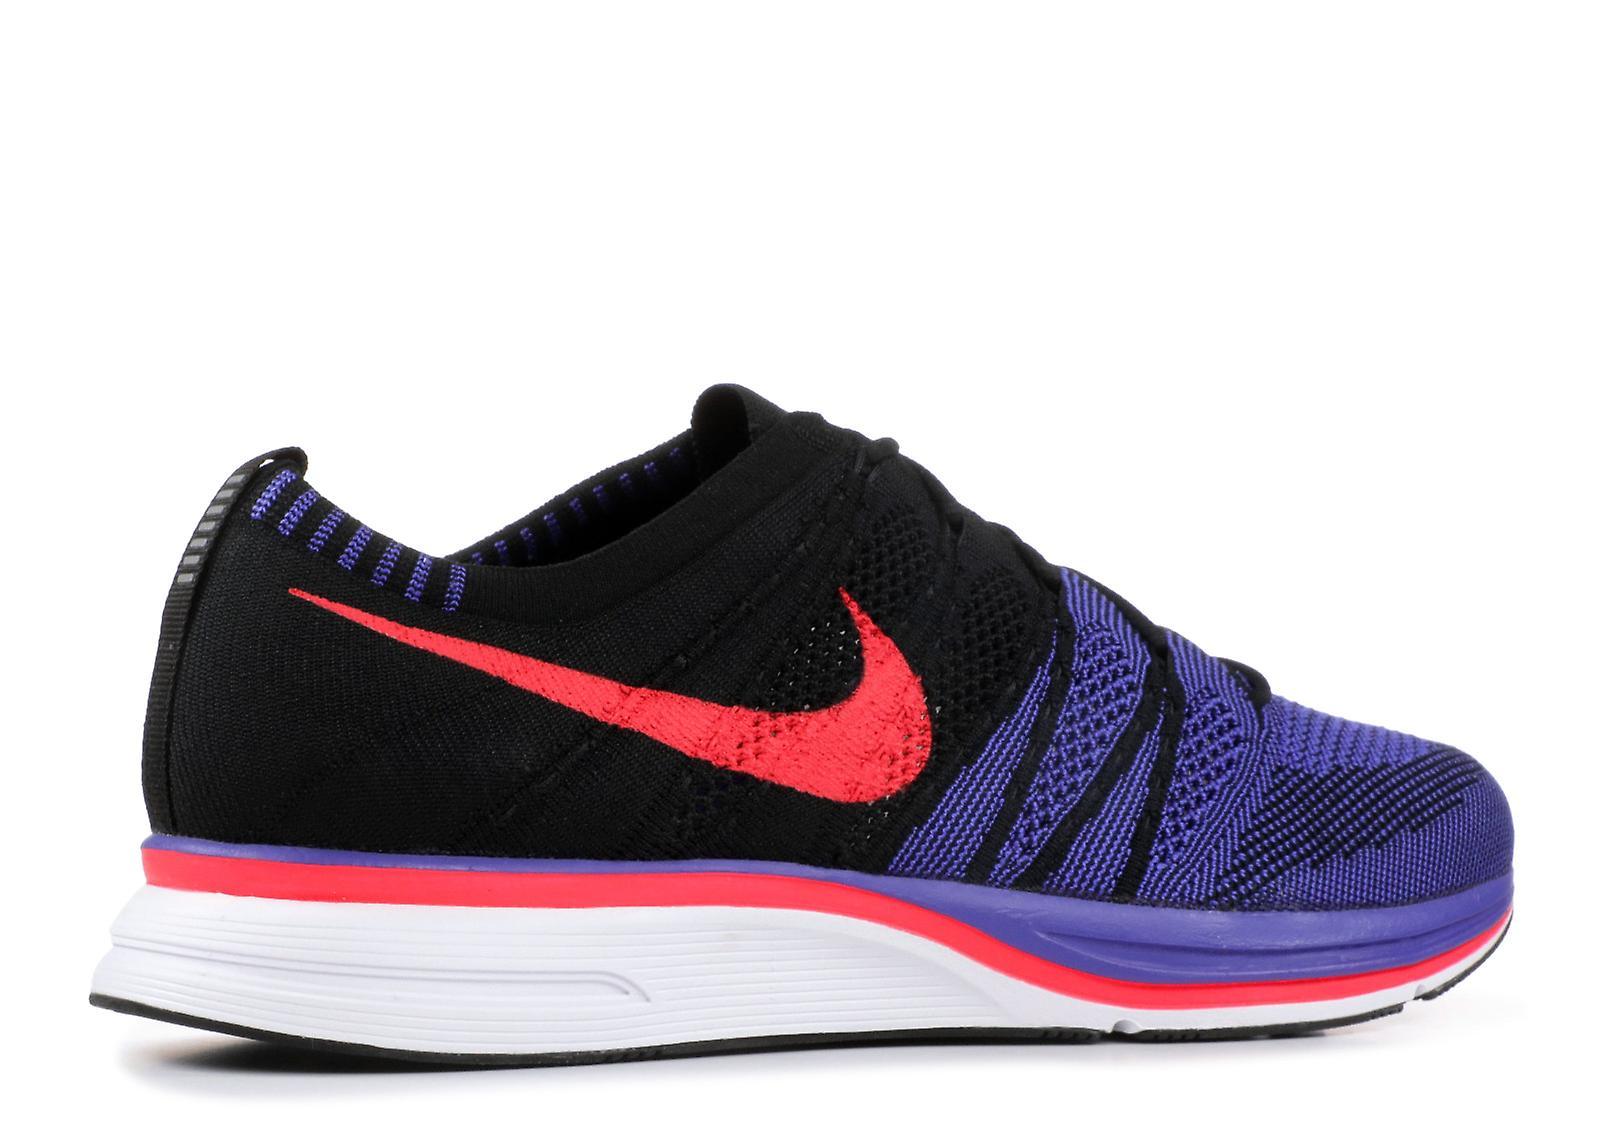 Nike Flyknit Trainer - Ah8396-003 - skor